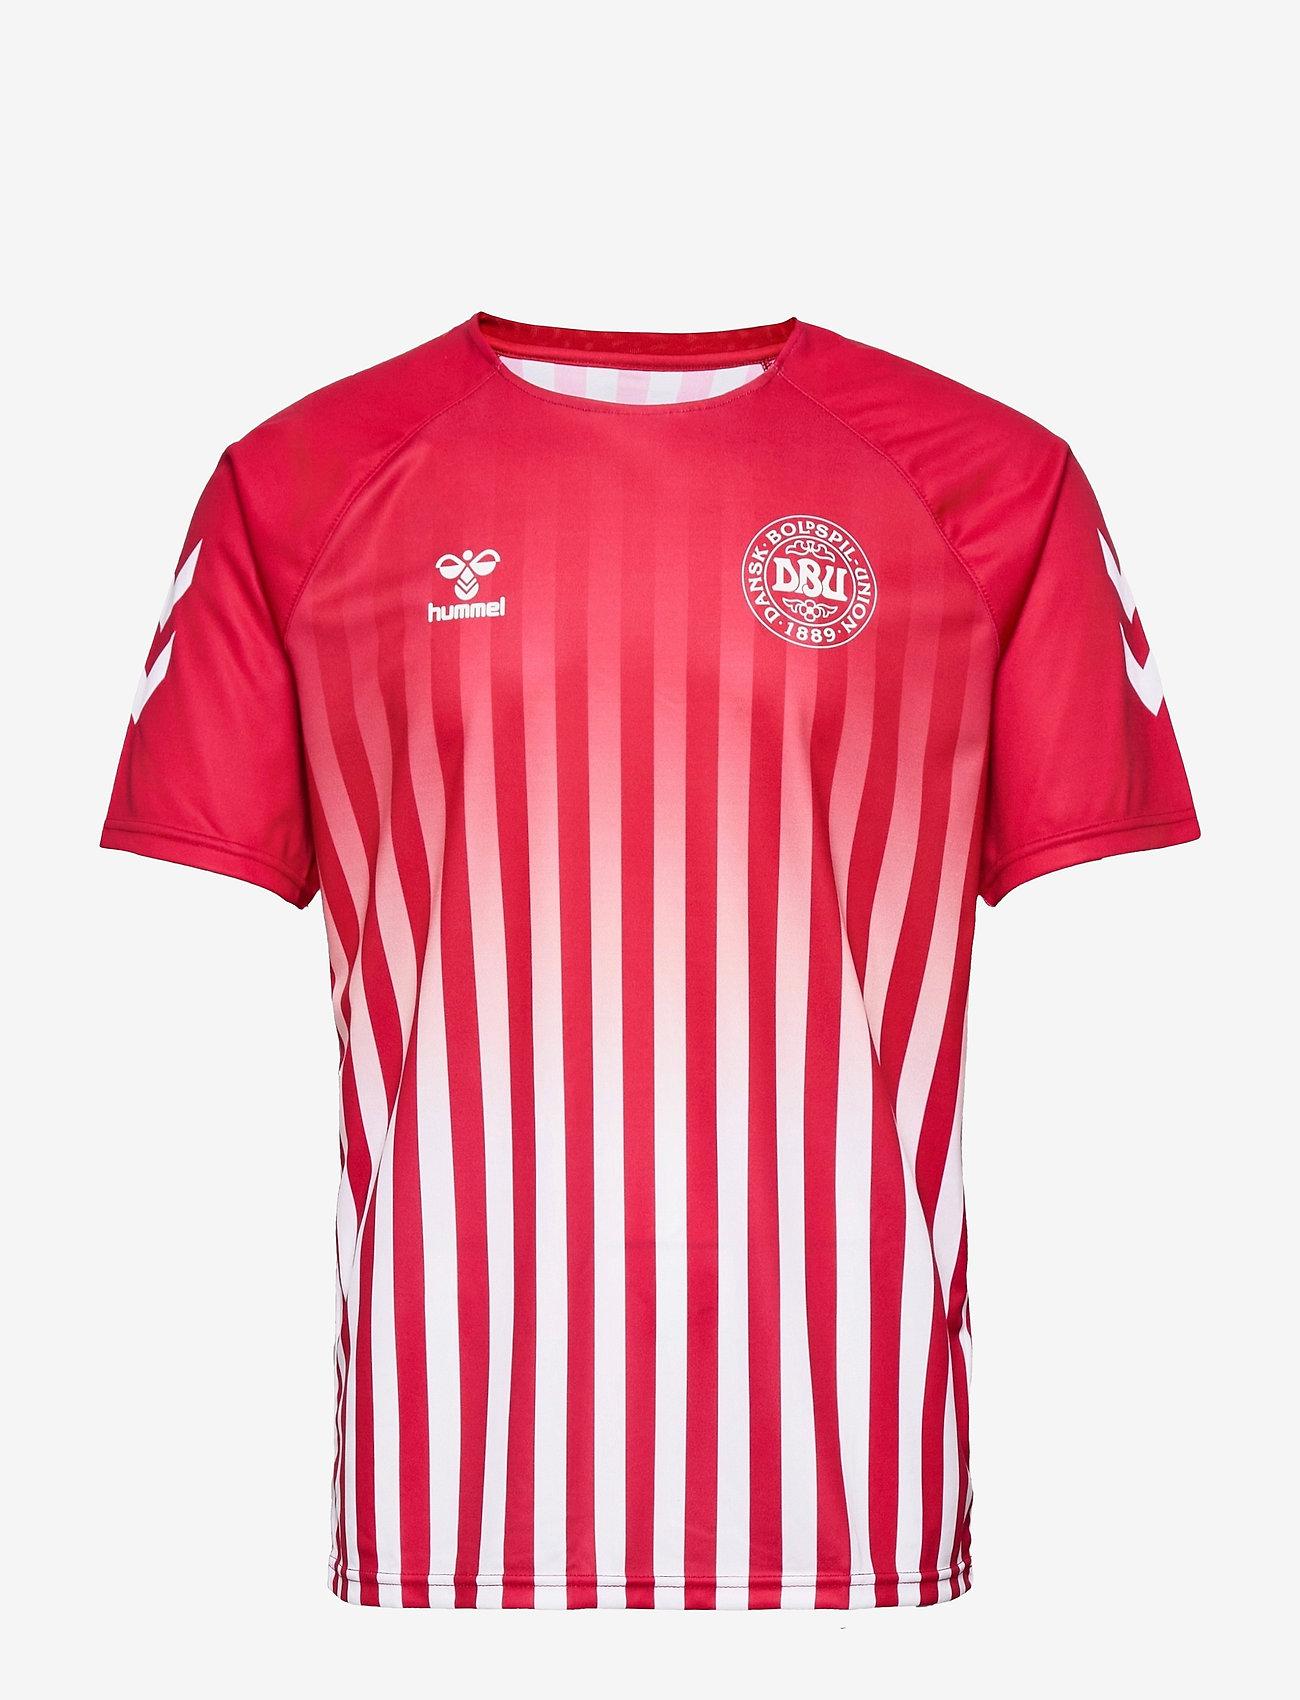 Hummel - DBU FAN 2020 RETRO TEE - football shirts - tango red/white - 0